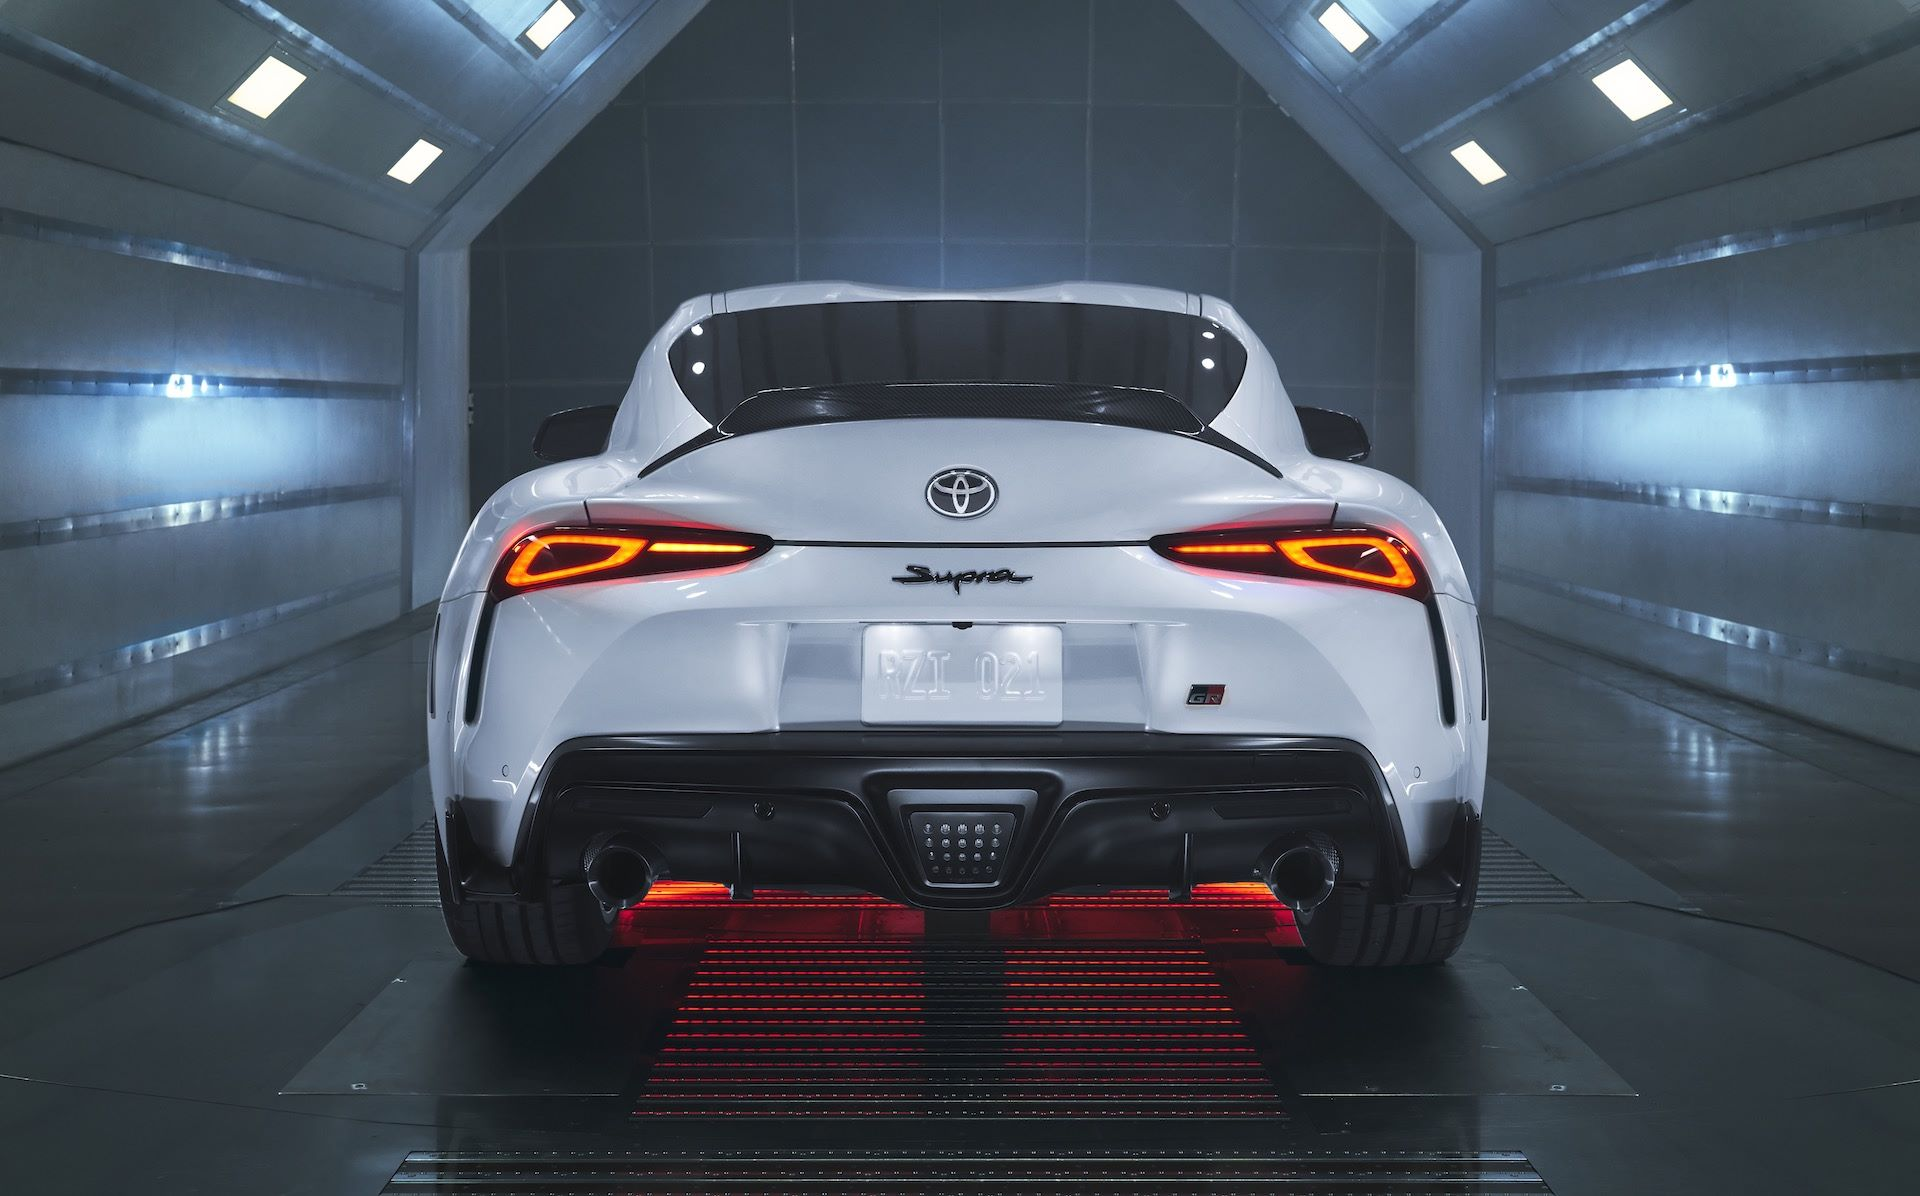 Toyota-Supra-A91-CF-Edition-10